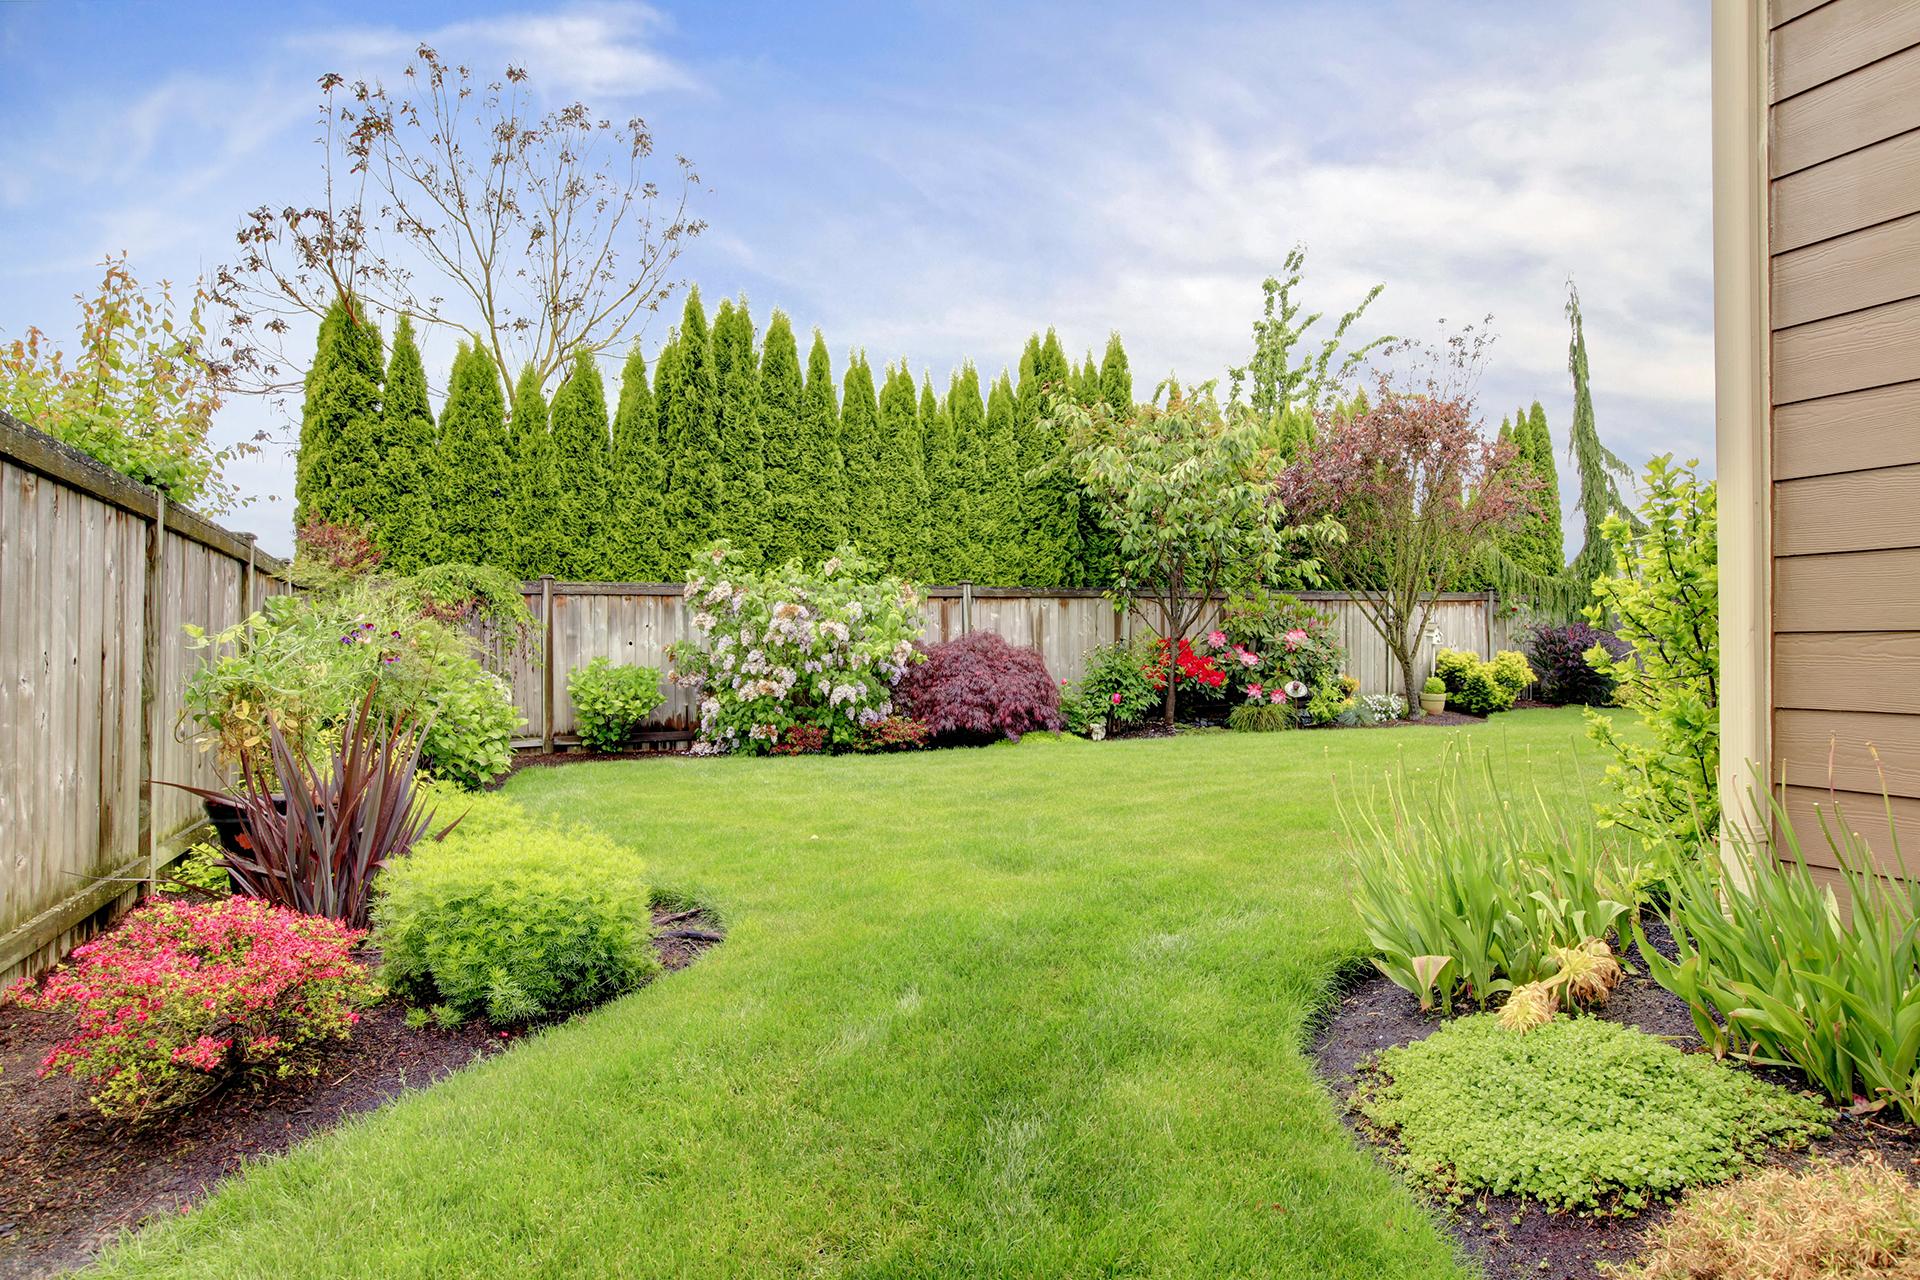 Plenty of room for a beautiful garden